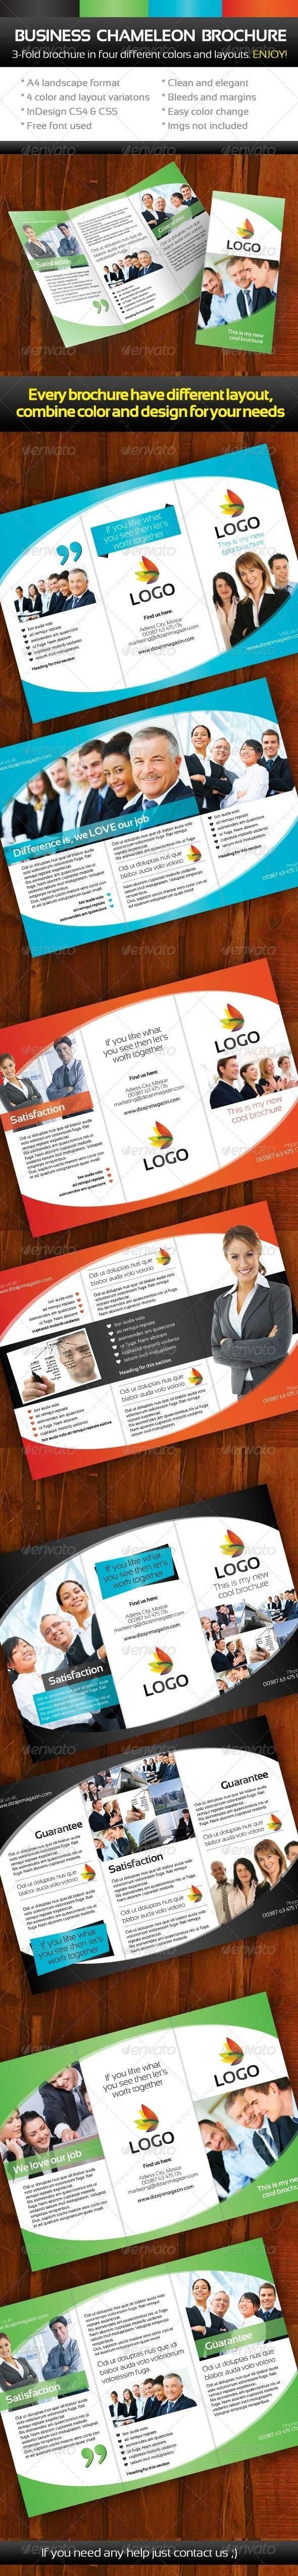 Chameleon Business Threefold Brochure - Corporate Brochures